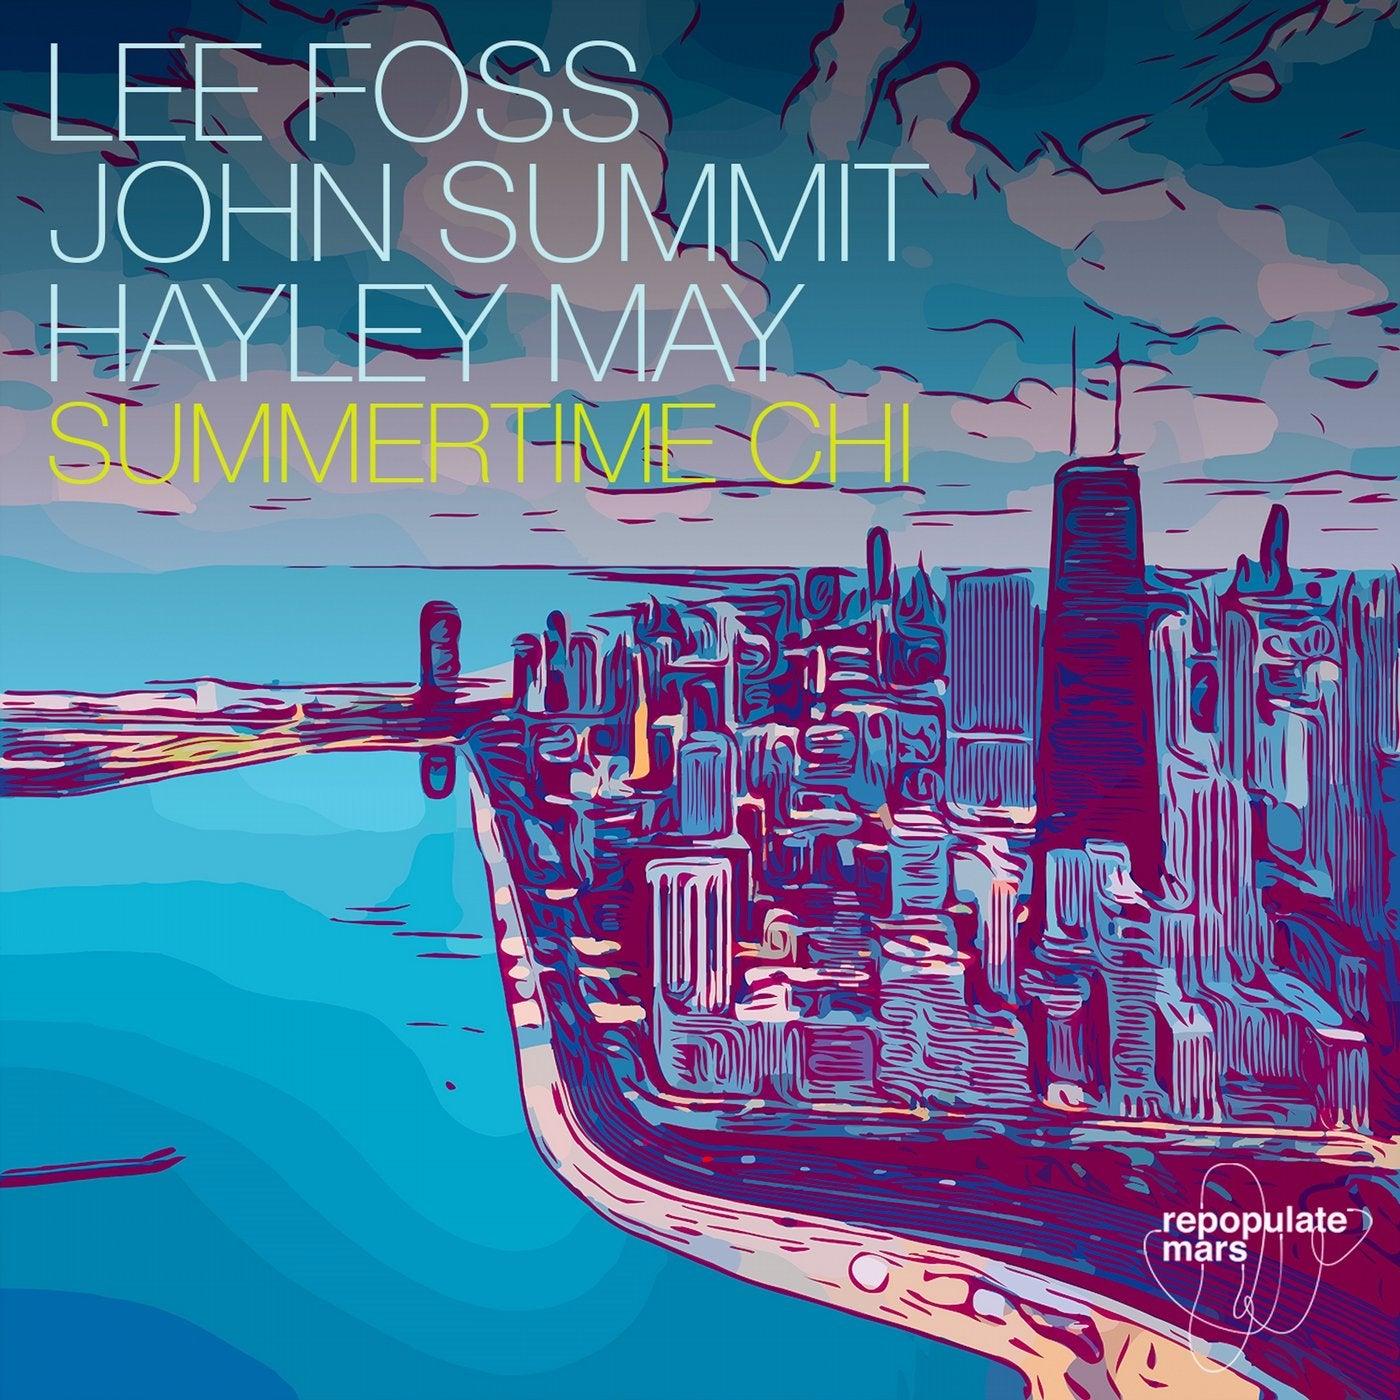 Summertime Chi (Original Mix)